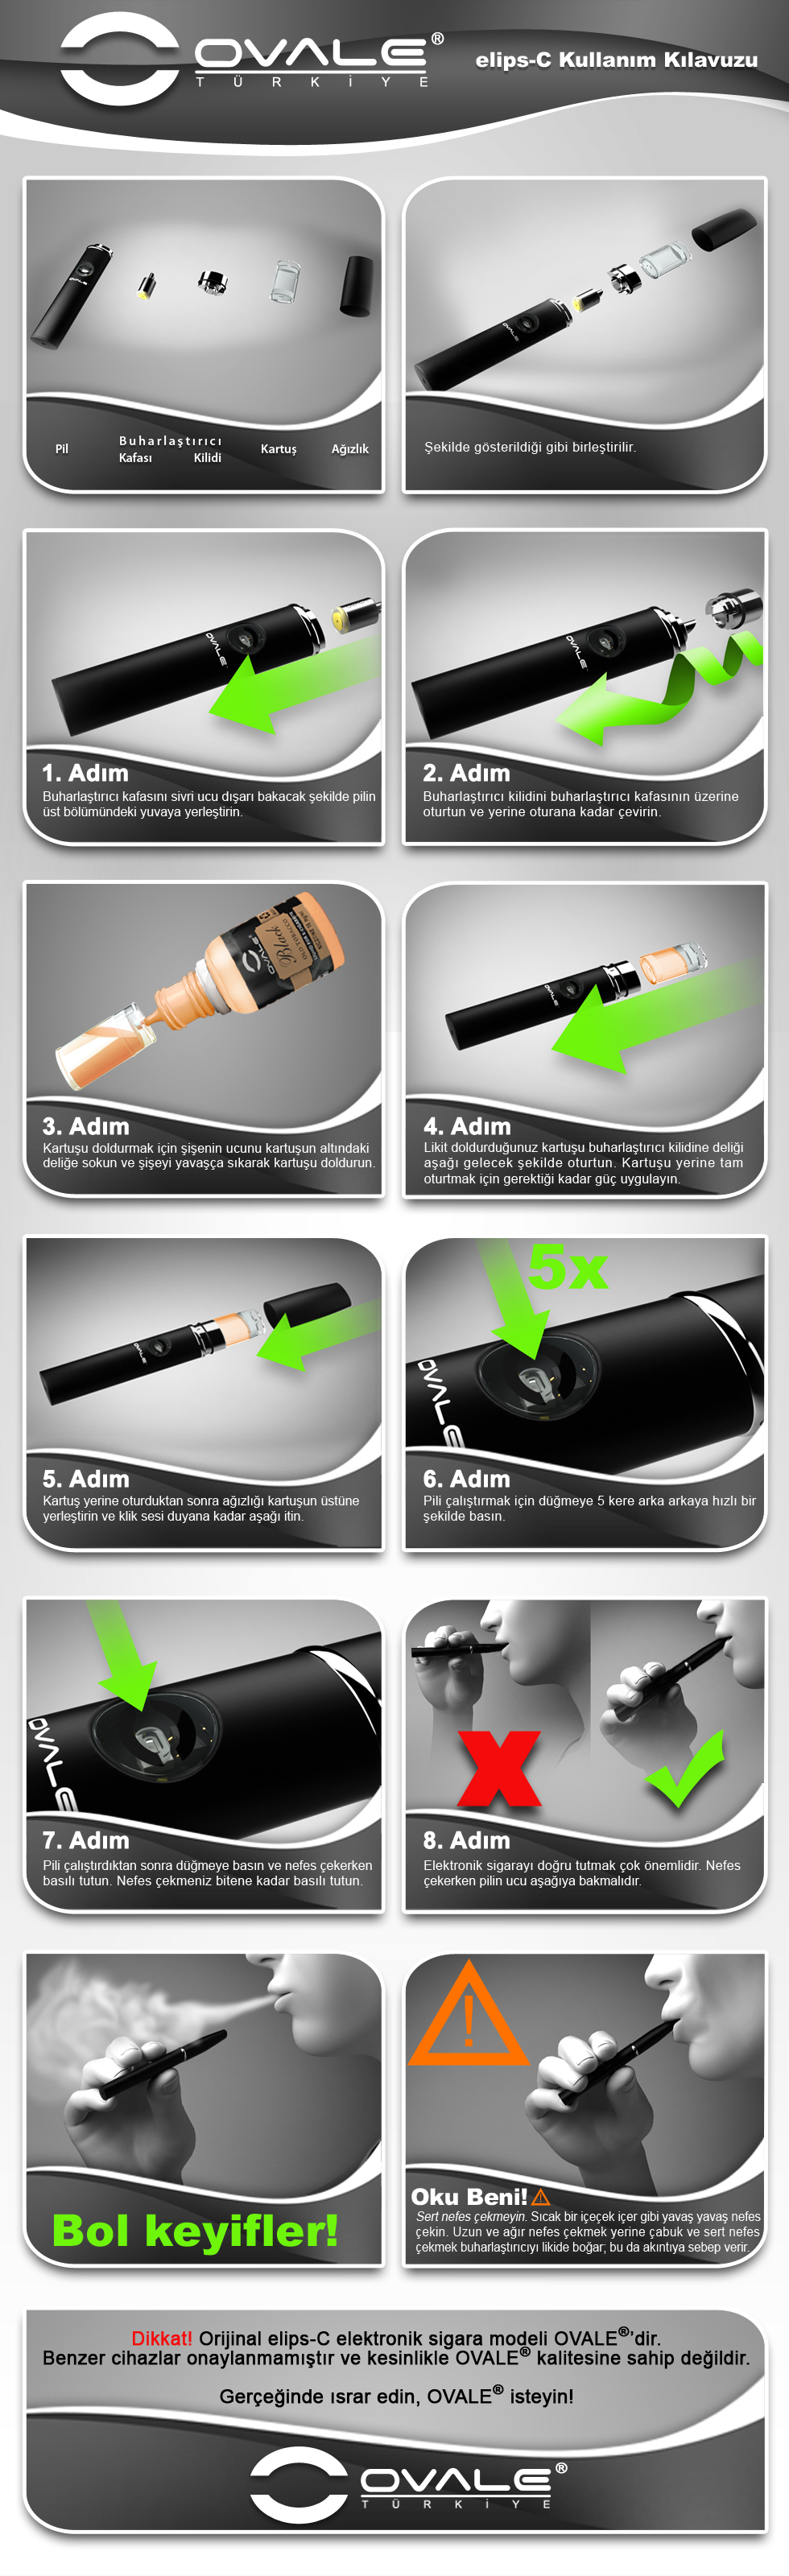 elektronik sigara, esigara, e sigara, e, sigara, sigara bırakma, elektronik sigara likiti, elips, elips c